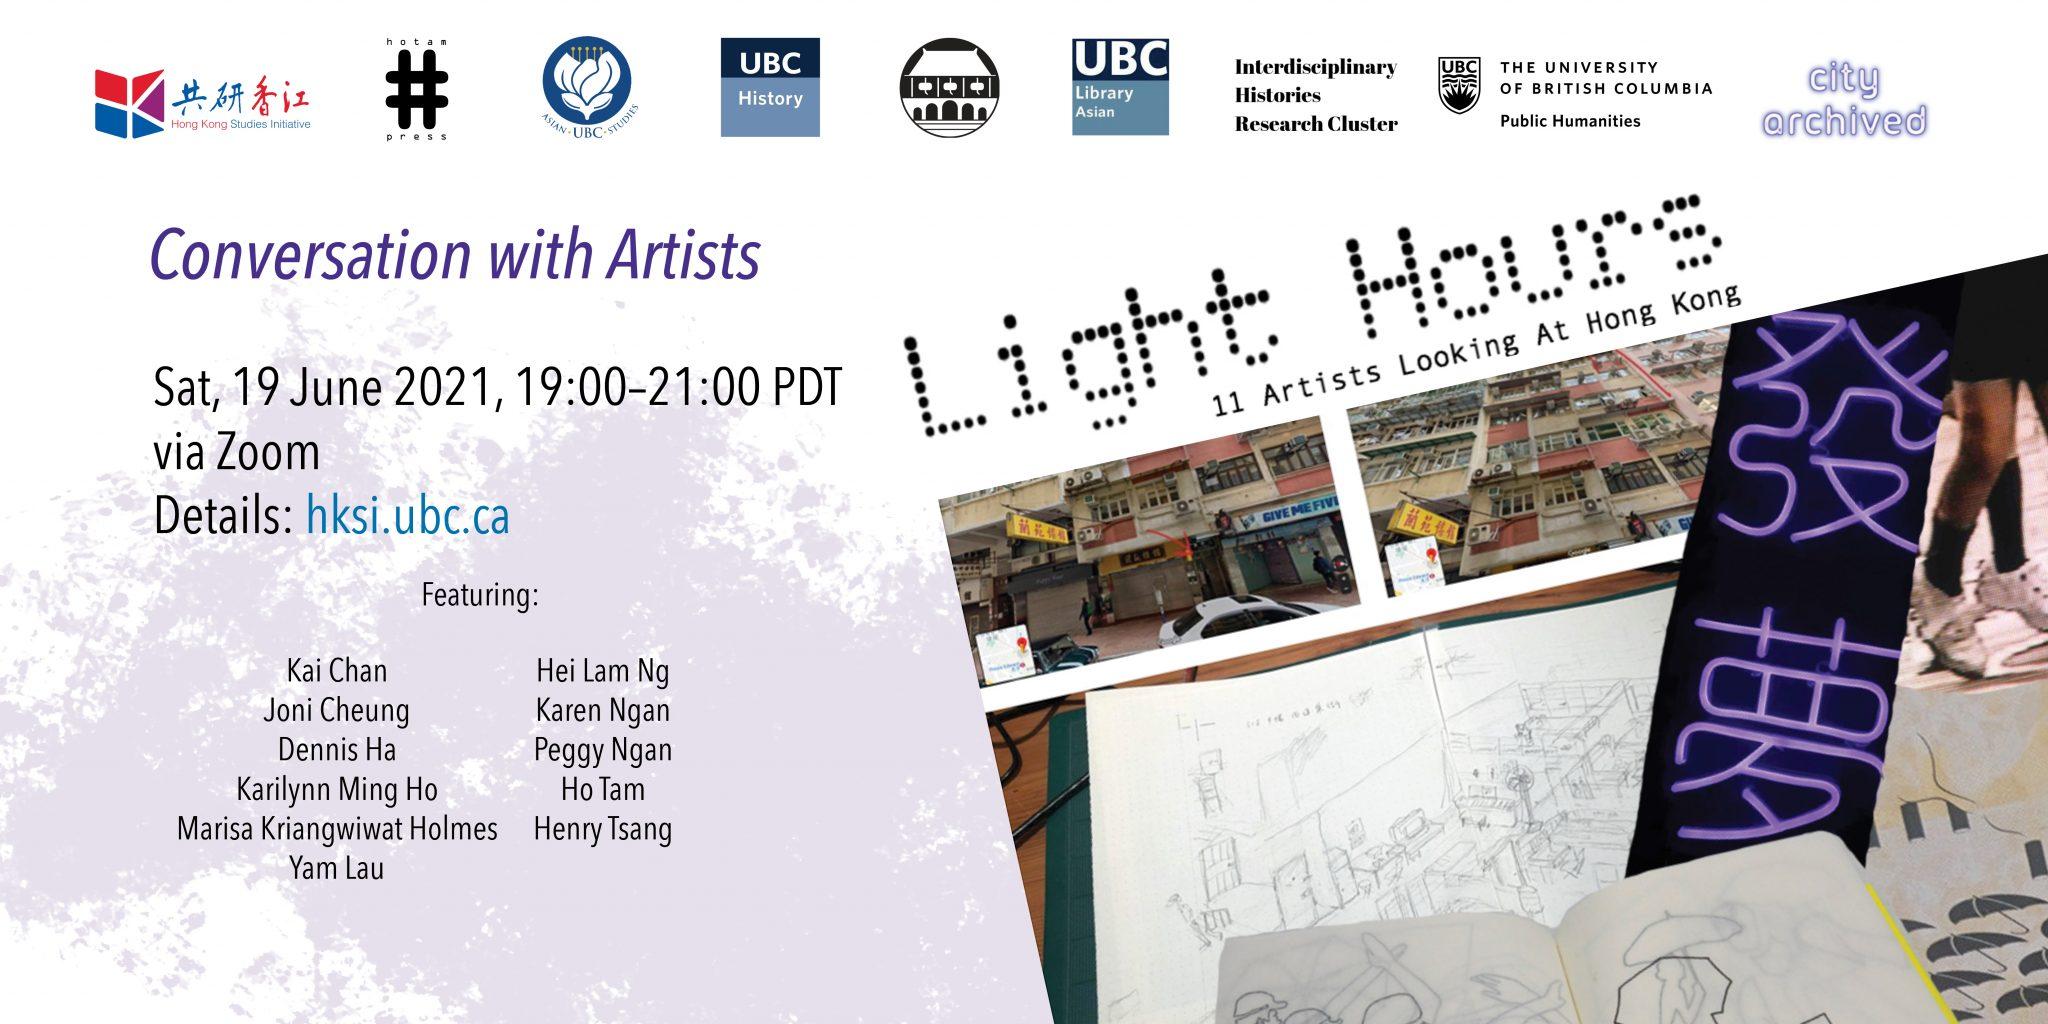 https://www.arts.ubc.ca/wp-content/uploads/sites/24/2021/06/Light-Hours.jpeg